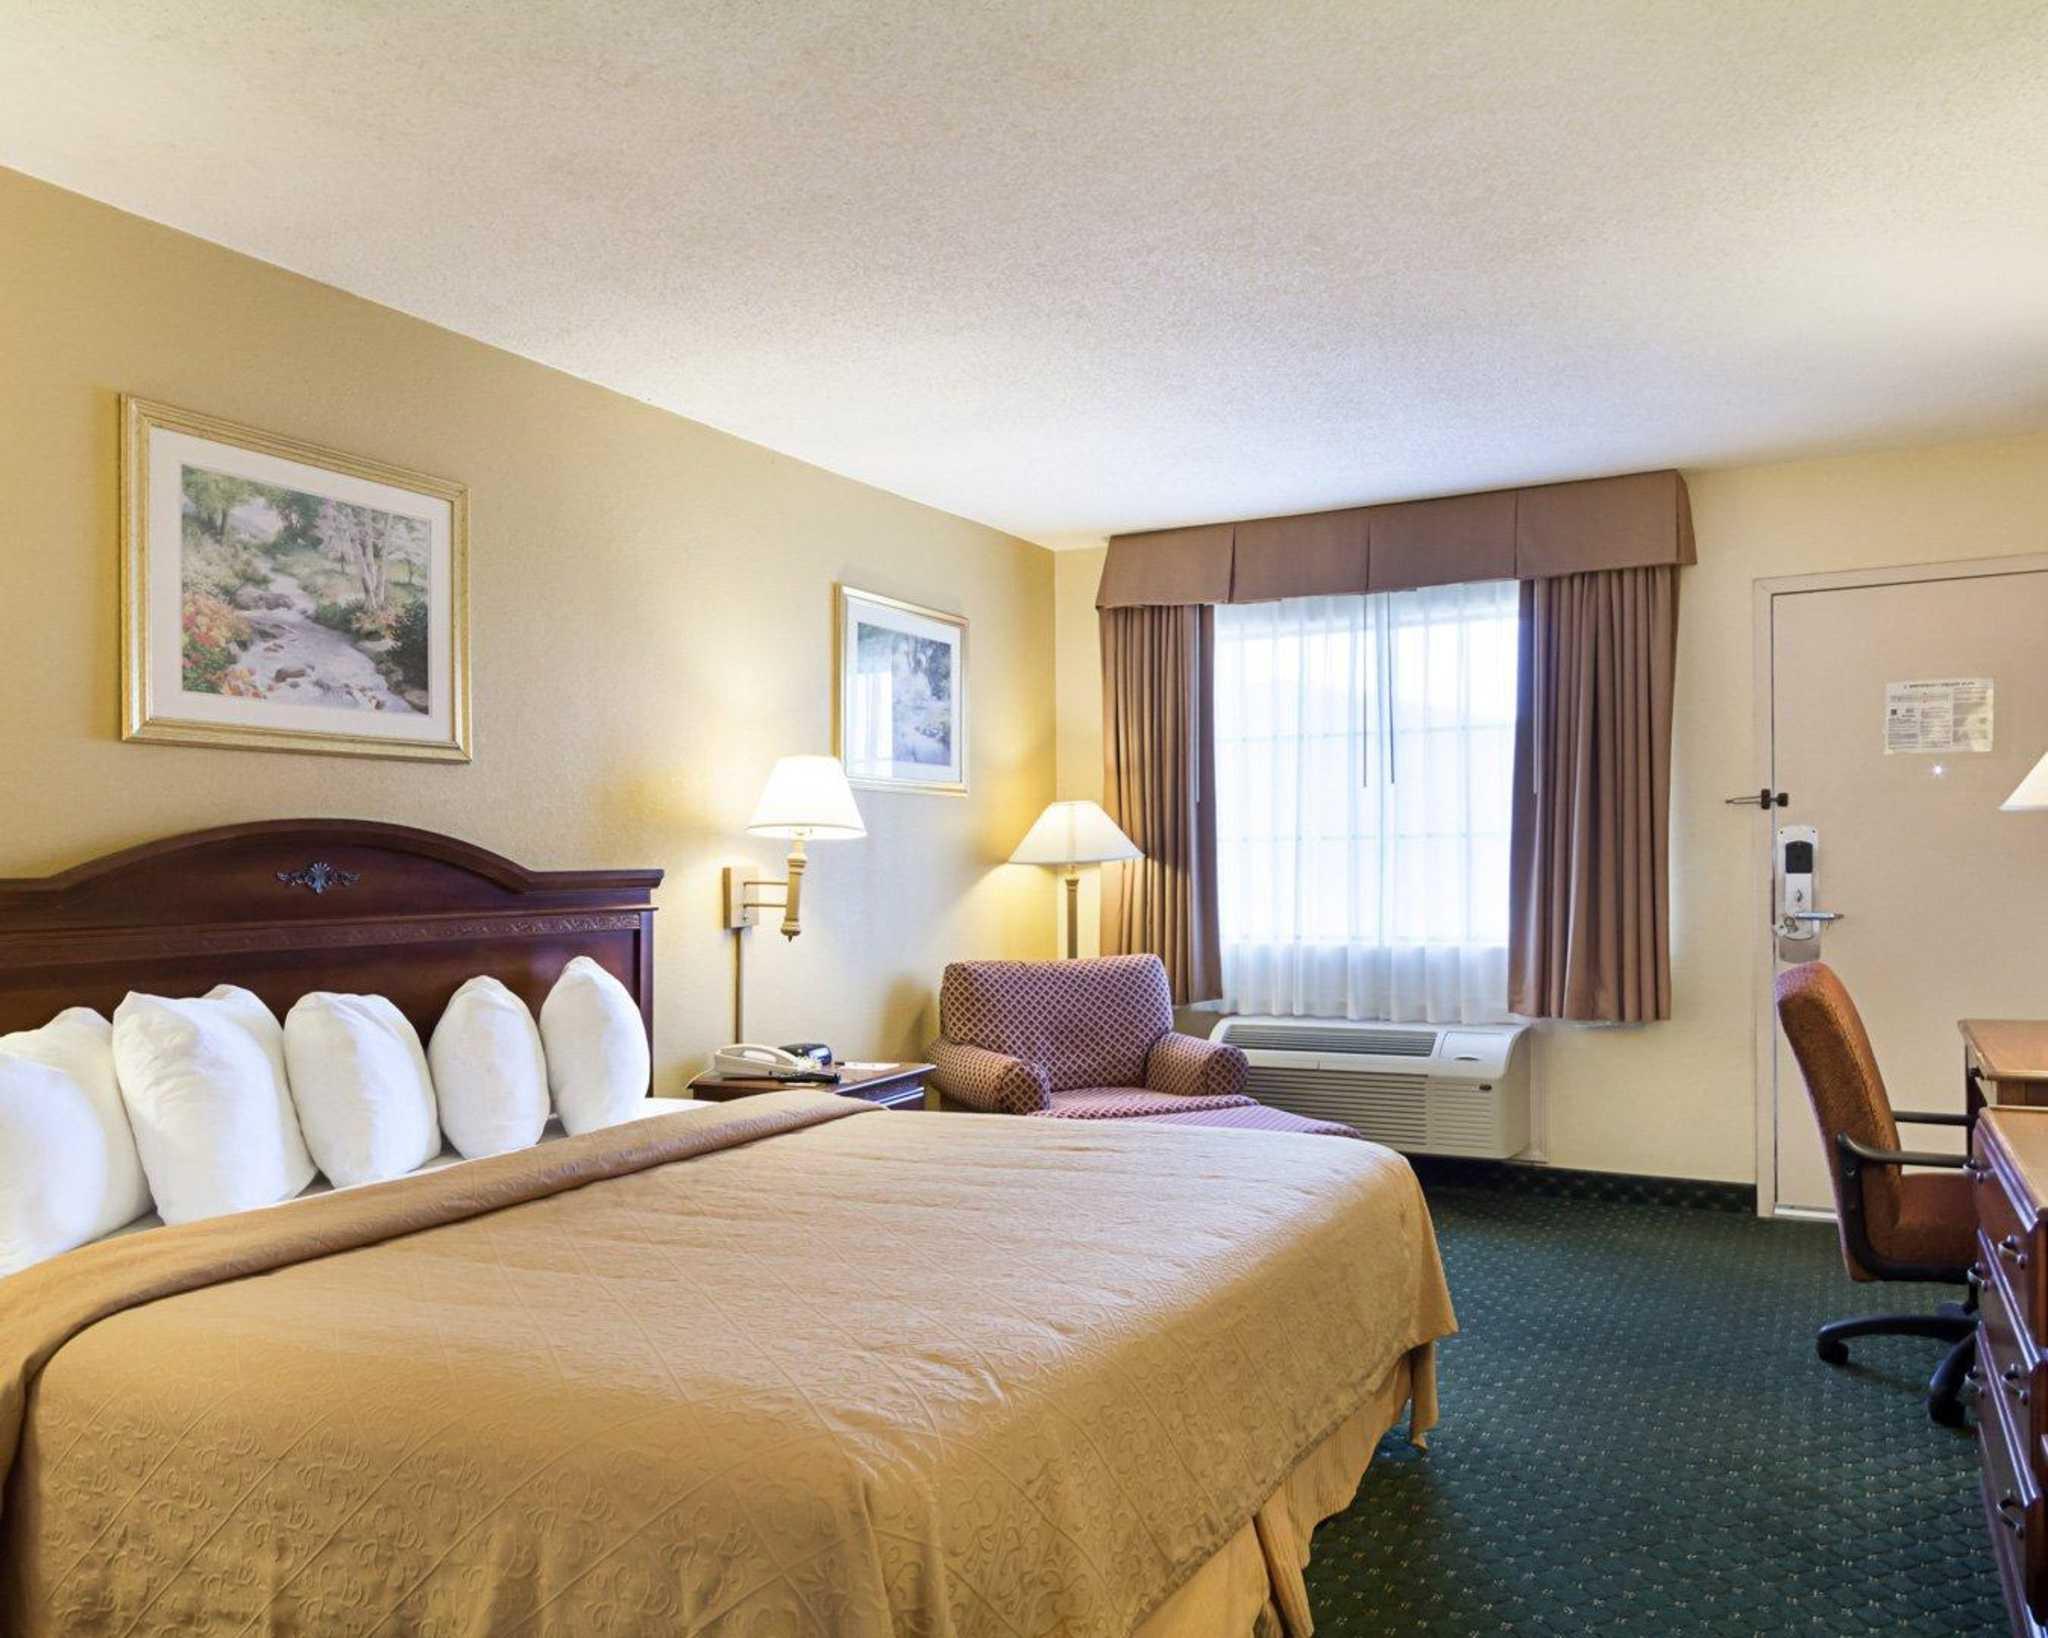 Quality Inn & Suites Southwest image 11